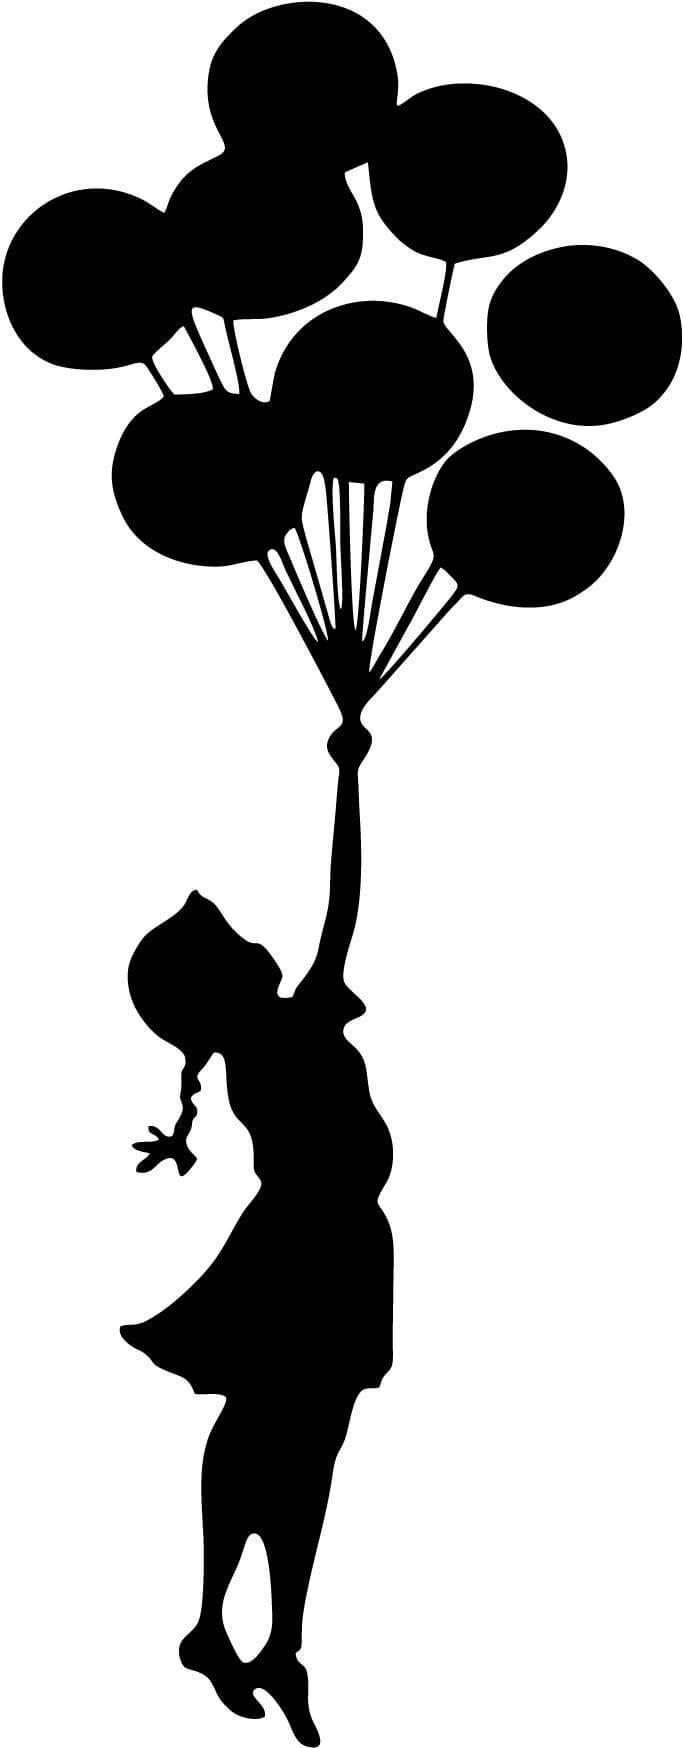 génial  Mot-Clé Banksy Flying Balloons Girl Graffiti Art Vinyl Car Window Laptop Decal Sticker